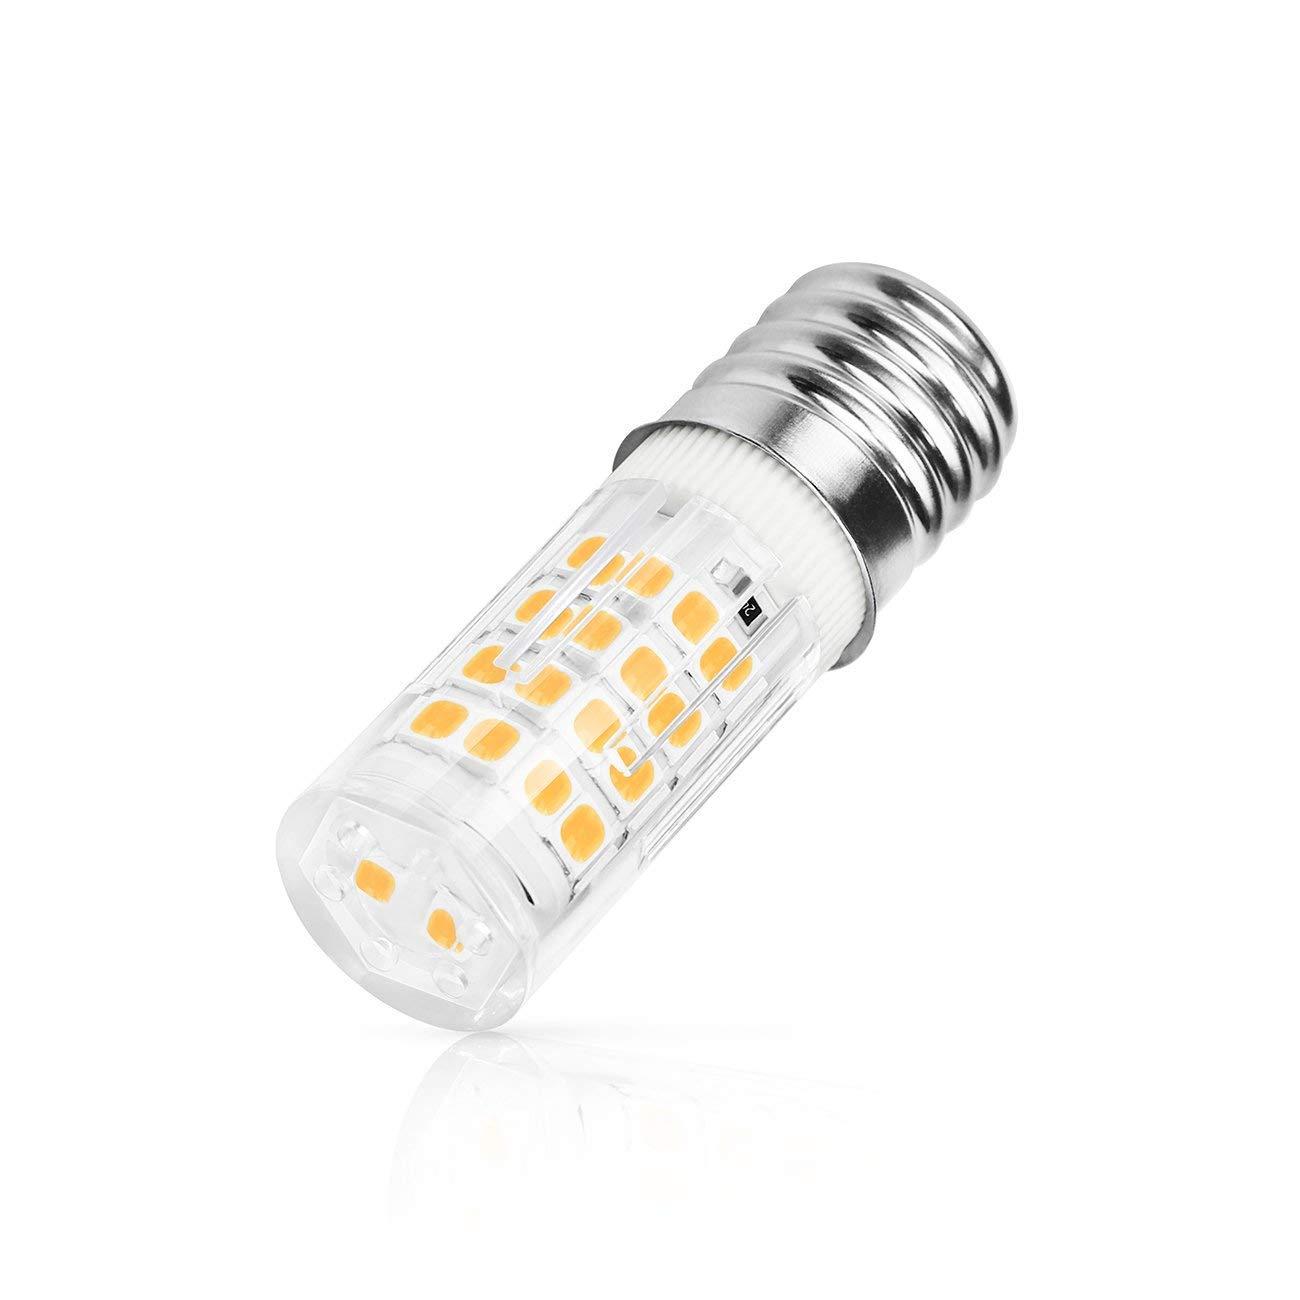 SHINE HAI E17 LED Bulb Microwave Oven Light, 470 Lumens, Warm White 2700K, 5W (50W Halogen Equivalent), 50x2835 SMD AC110-130V, Pack of 2